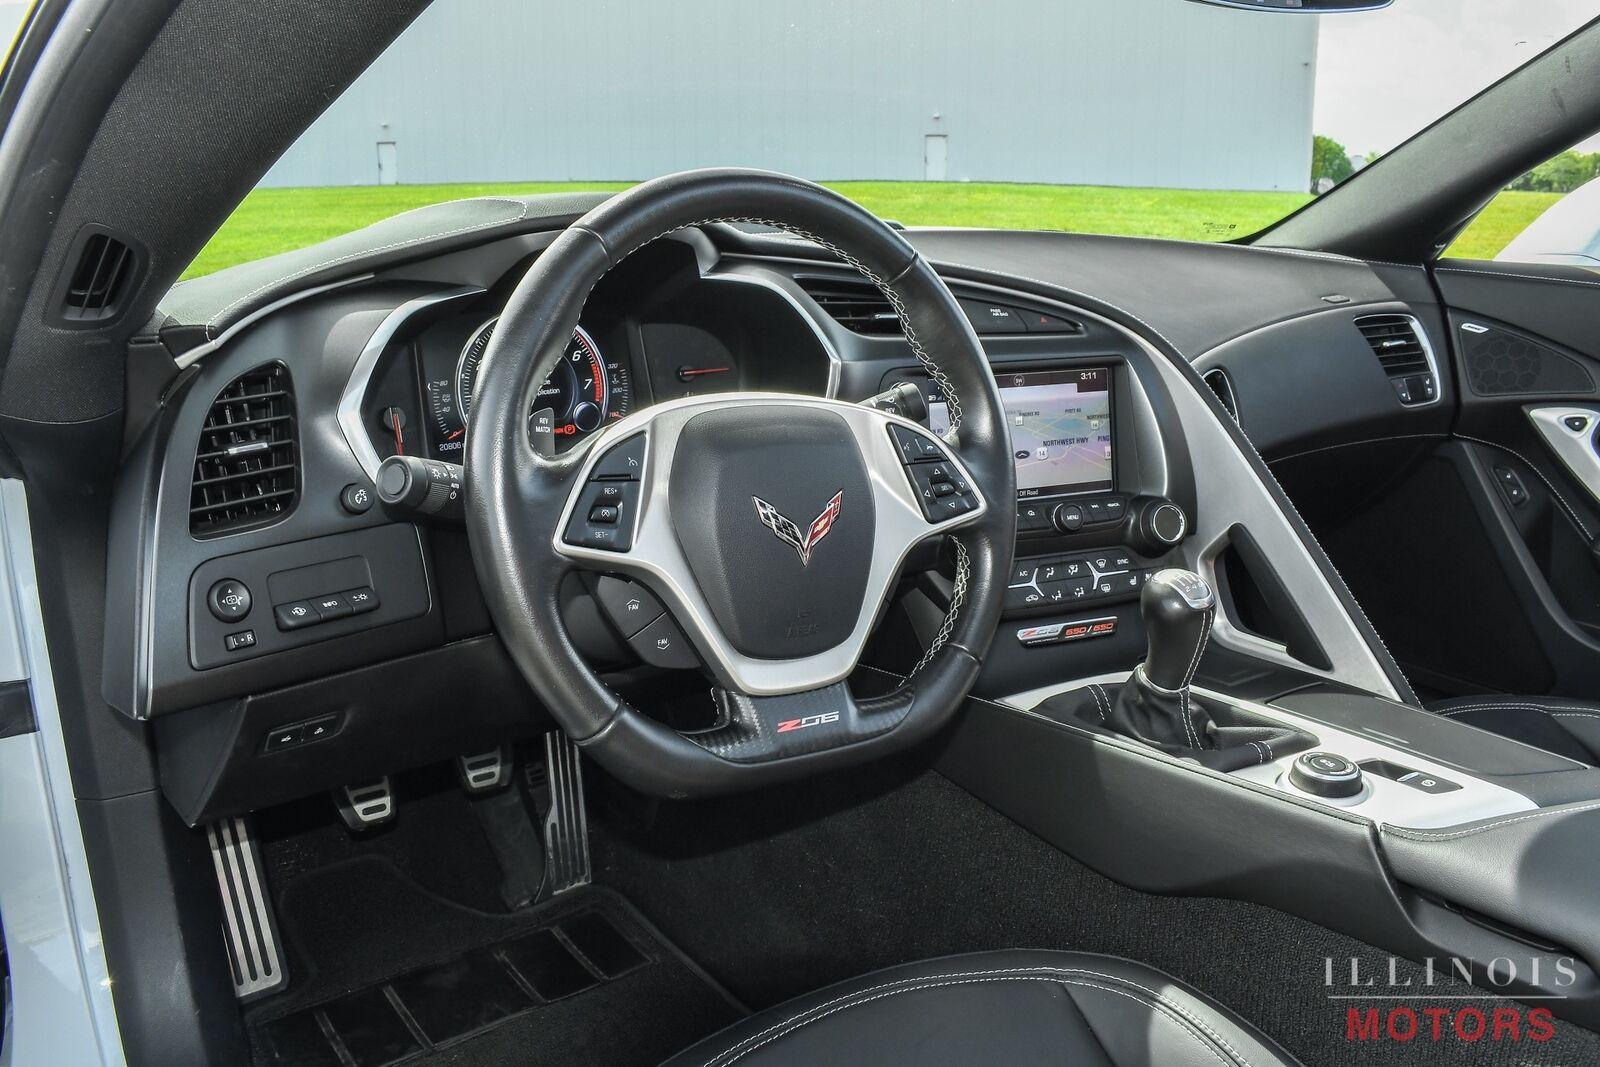 2019 Gray Chevrolet Corvette Z06  | C7 Corvette Photo 10